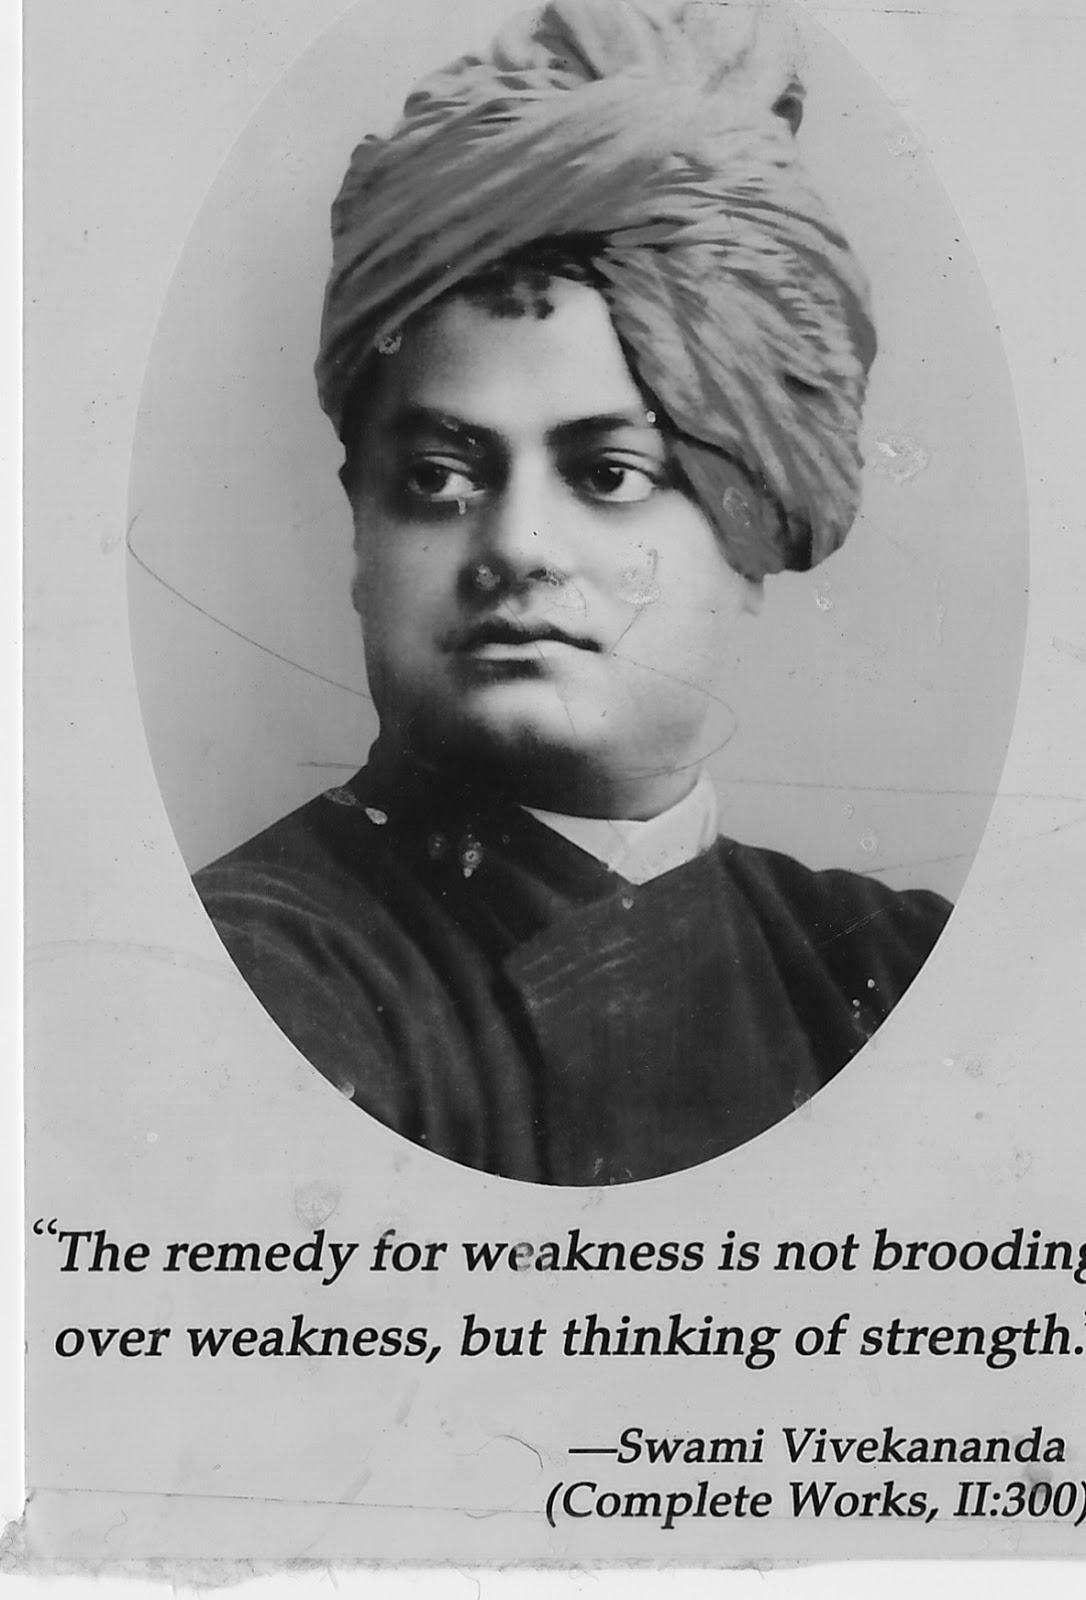 quotes by swami vivekananda quotesgram quotes by swami vivekananda quotesgram